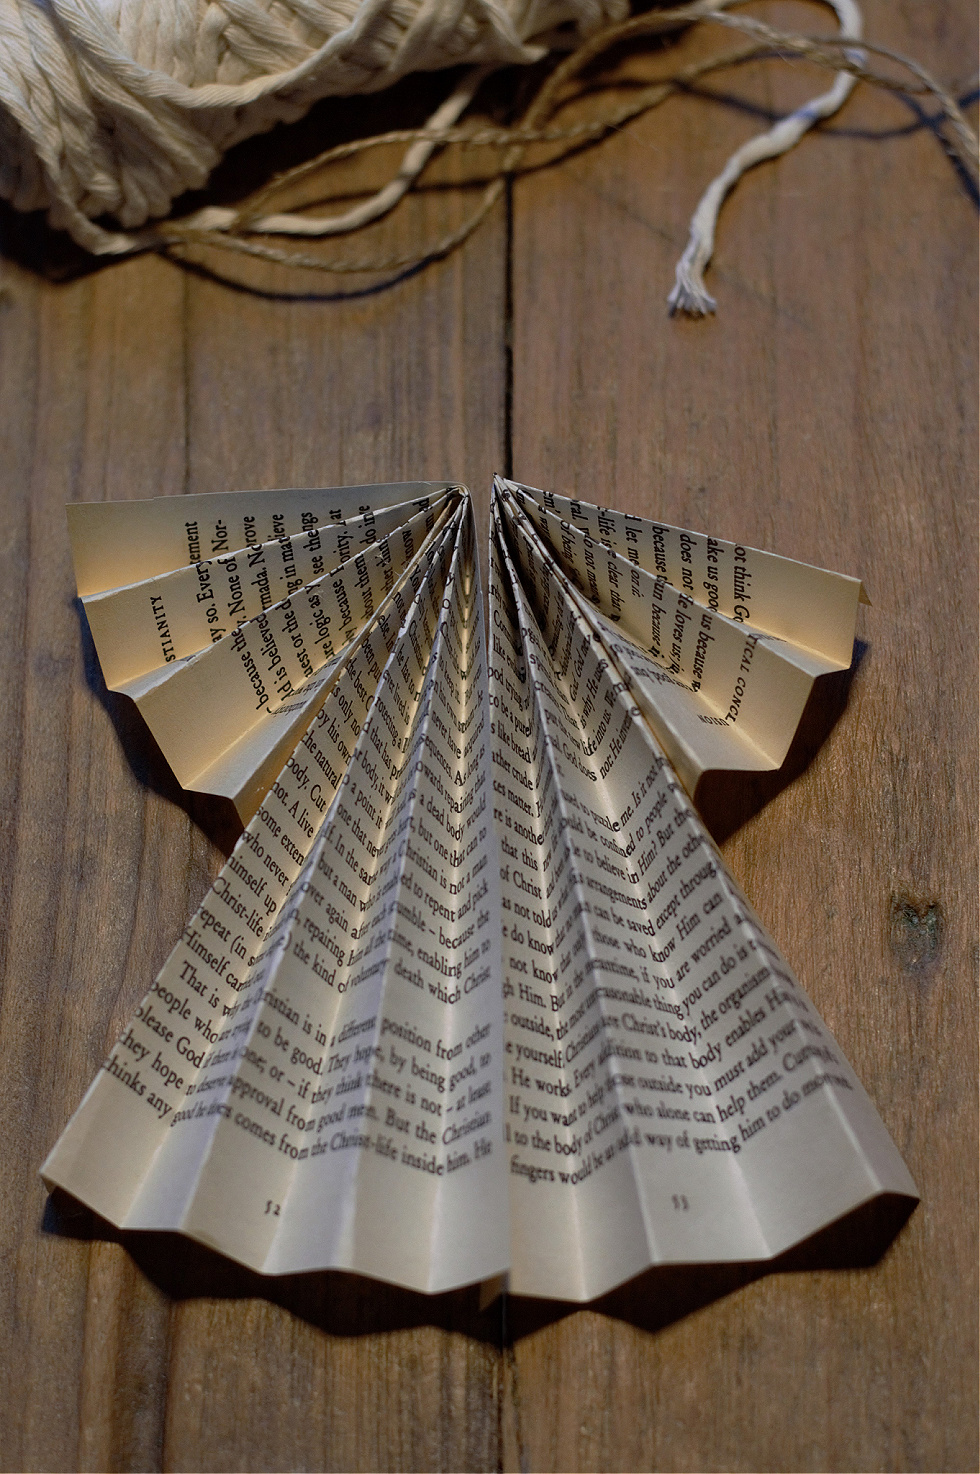 Askartele enkeli kirjan sivuista